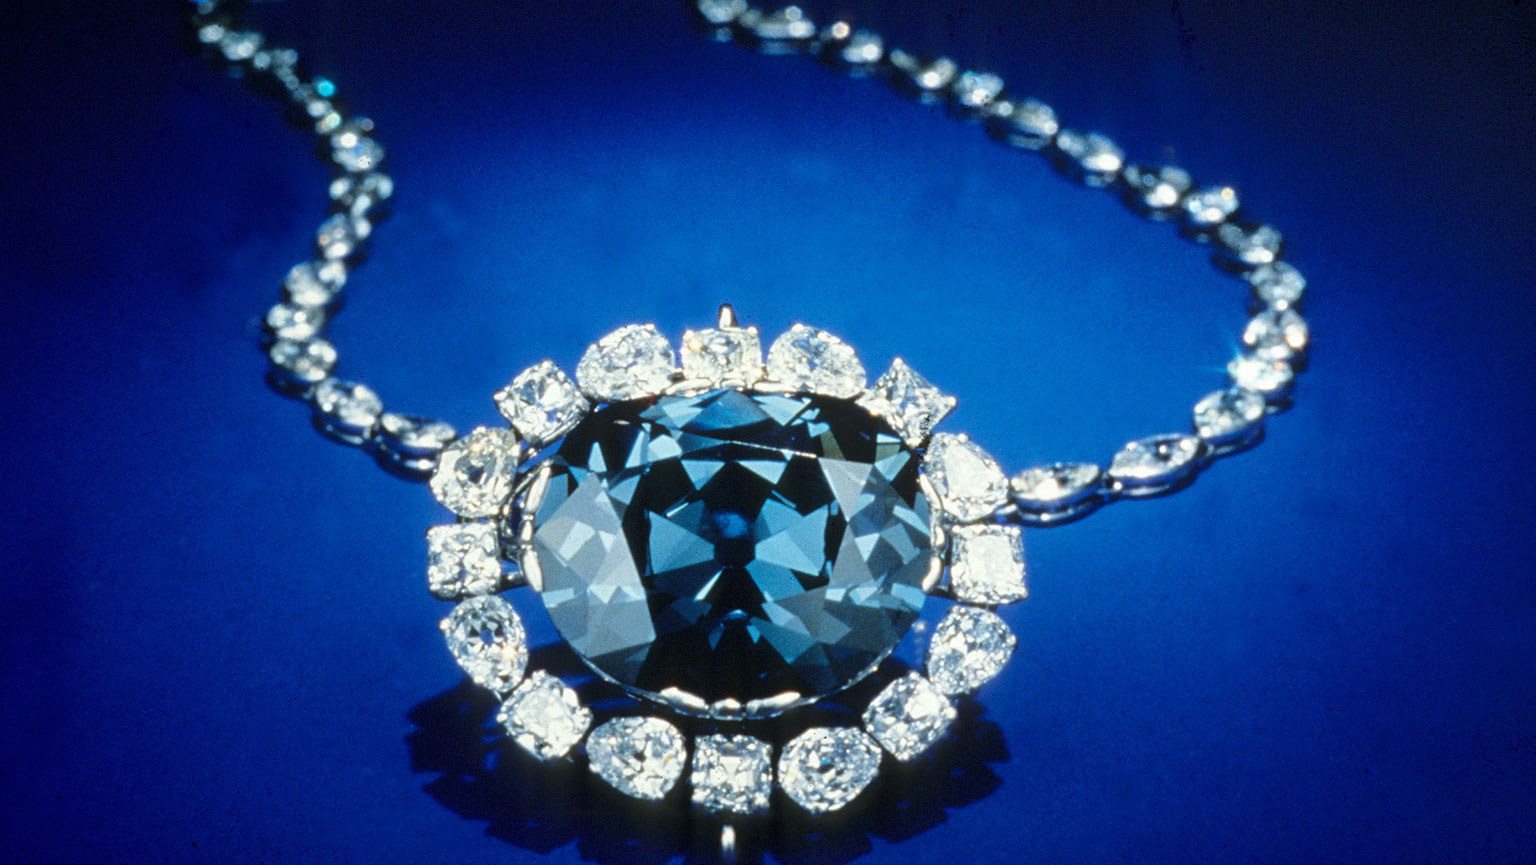 The Hope Diamond—America's Crown Jewel